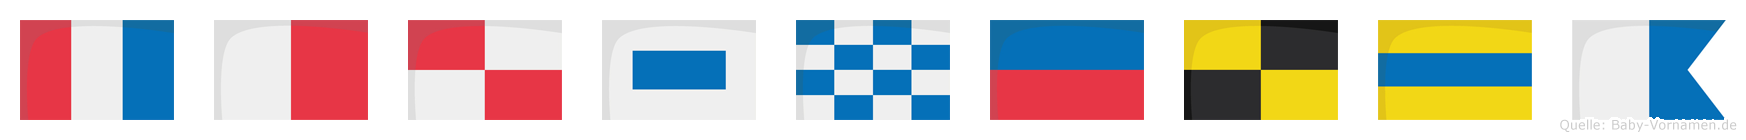 Thusnelda im Flaggenalphabet